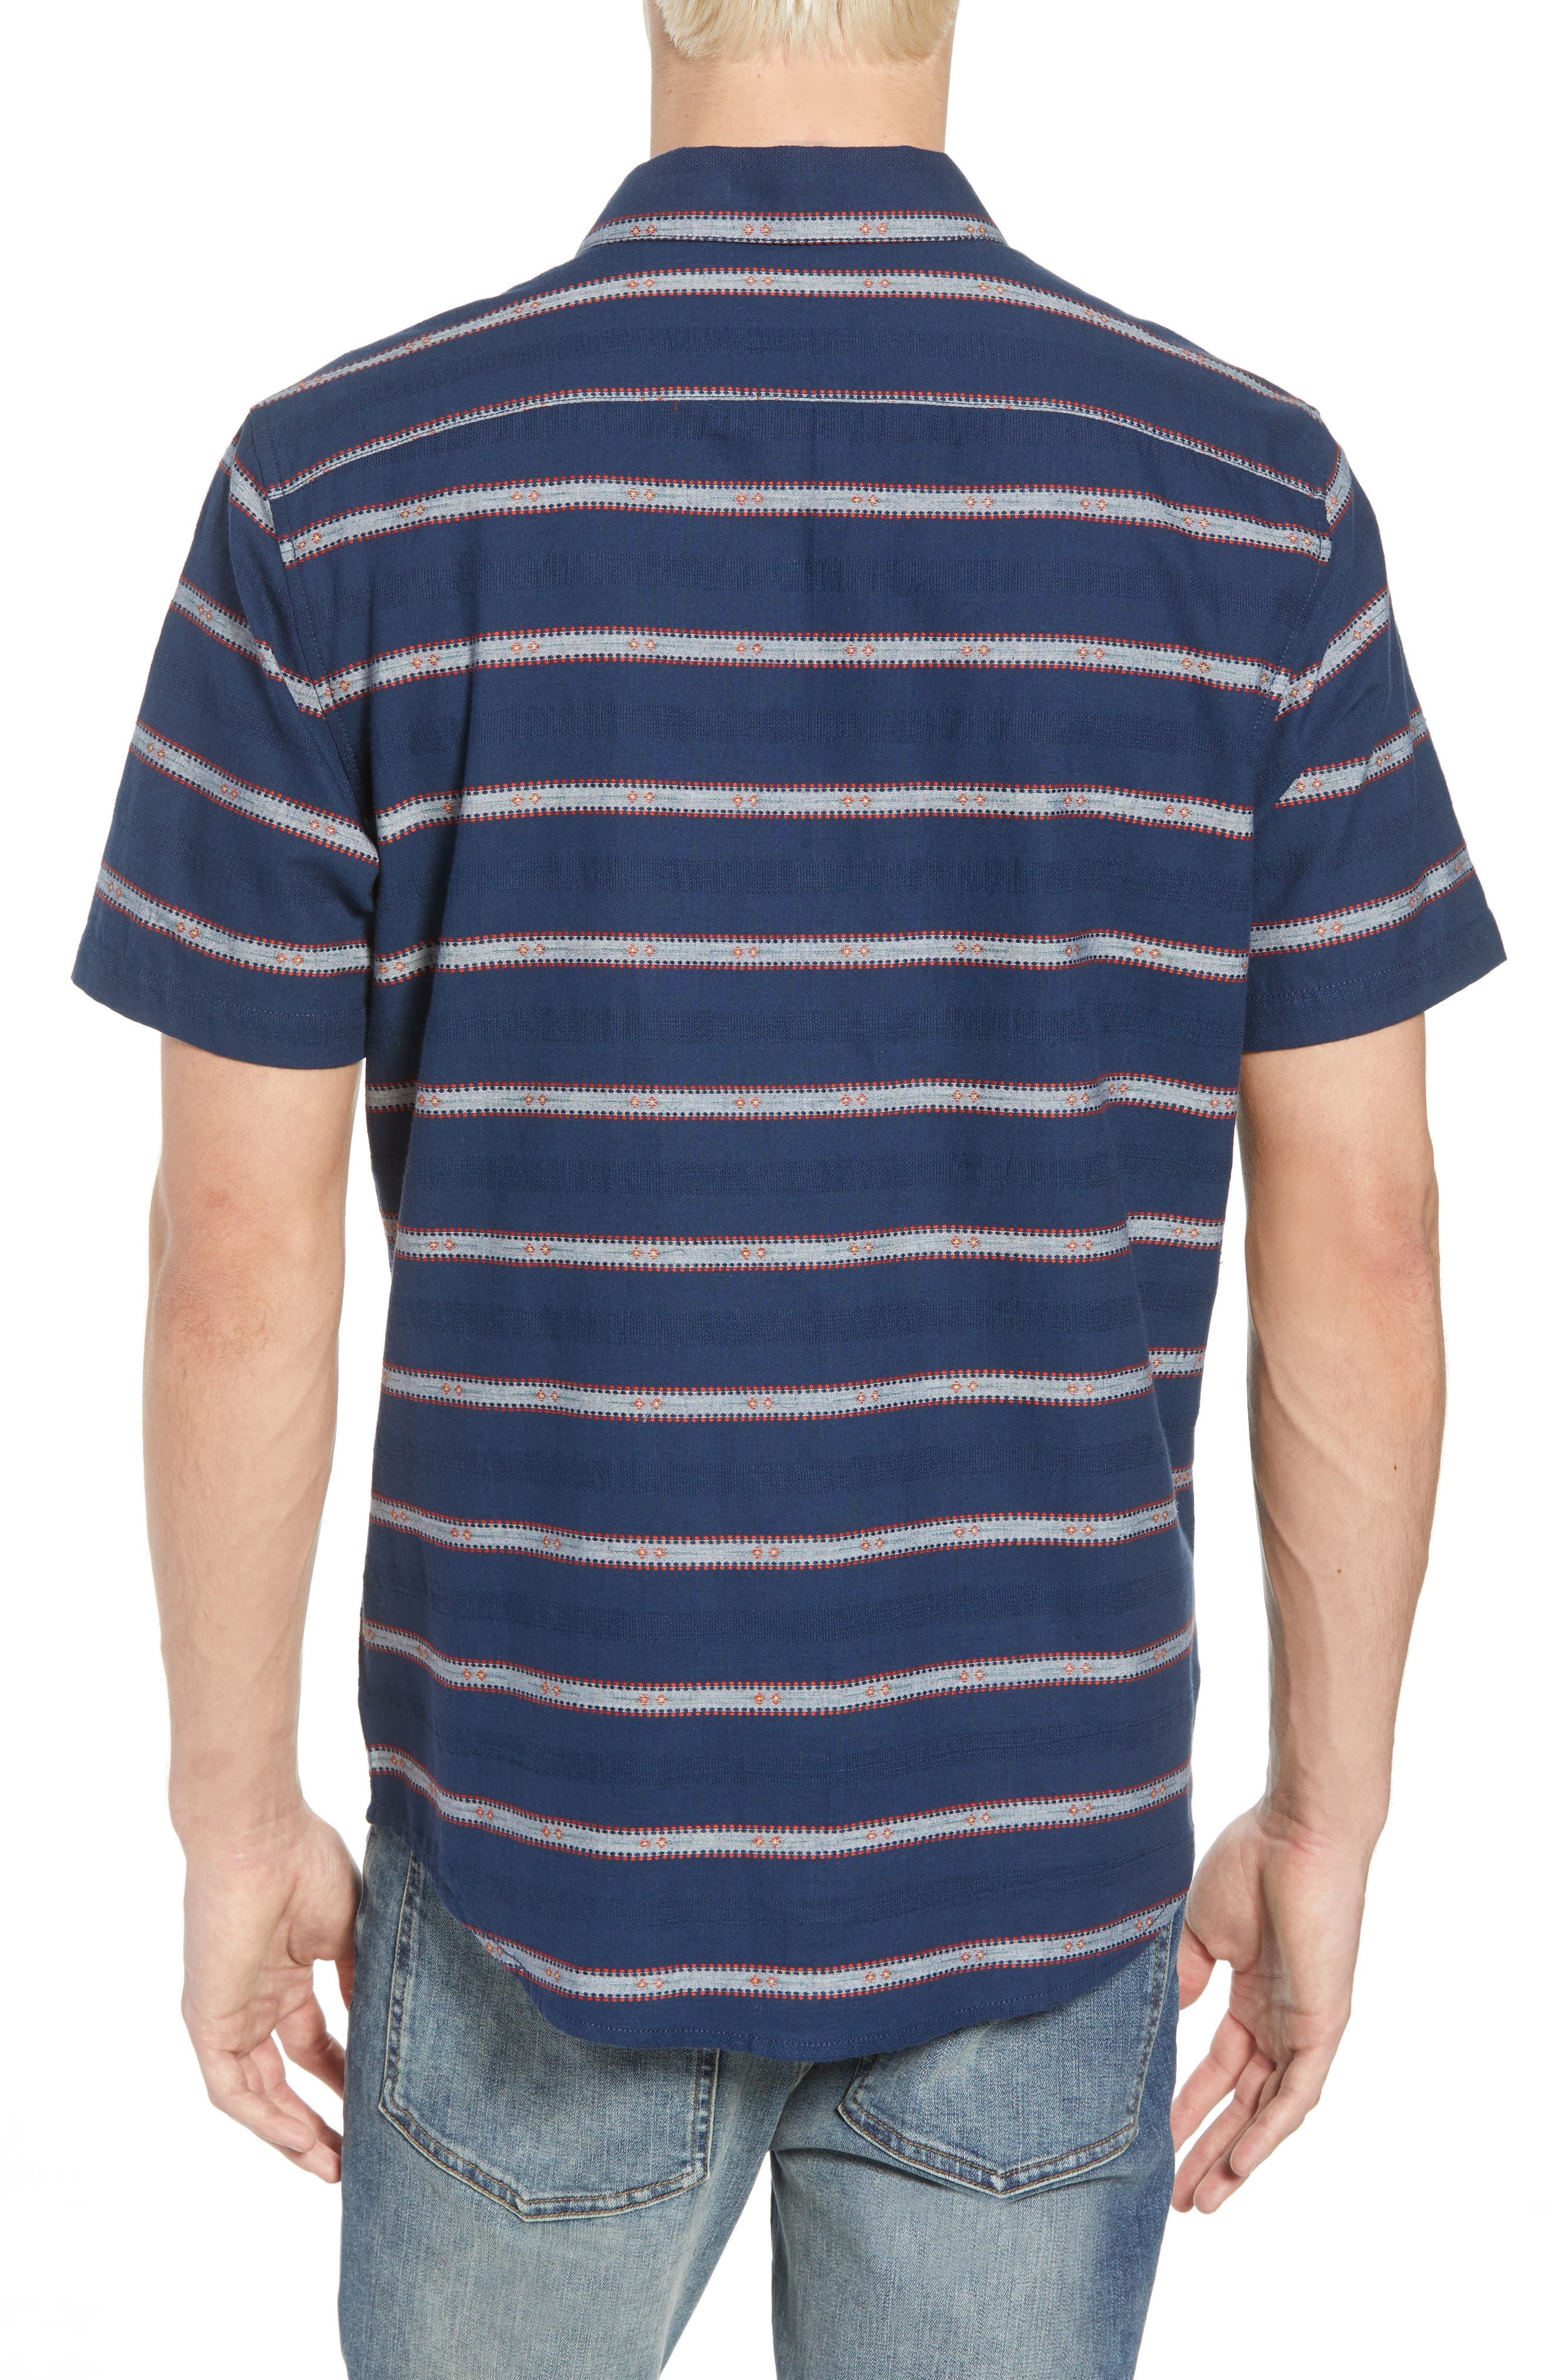 Outer Sunset Woven Shirt,                             Alternate thumbnail 2, color,                             487